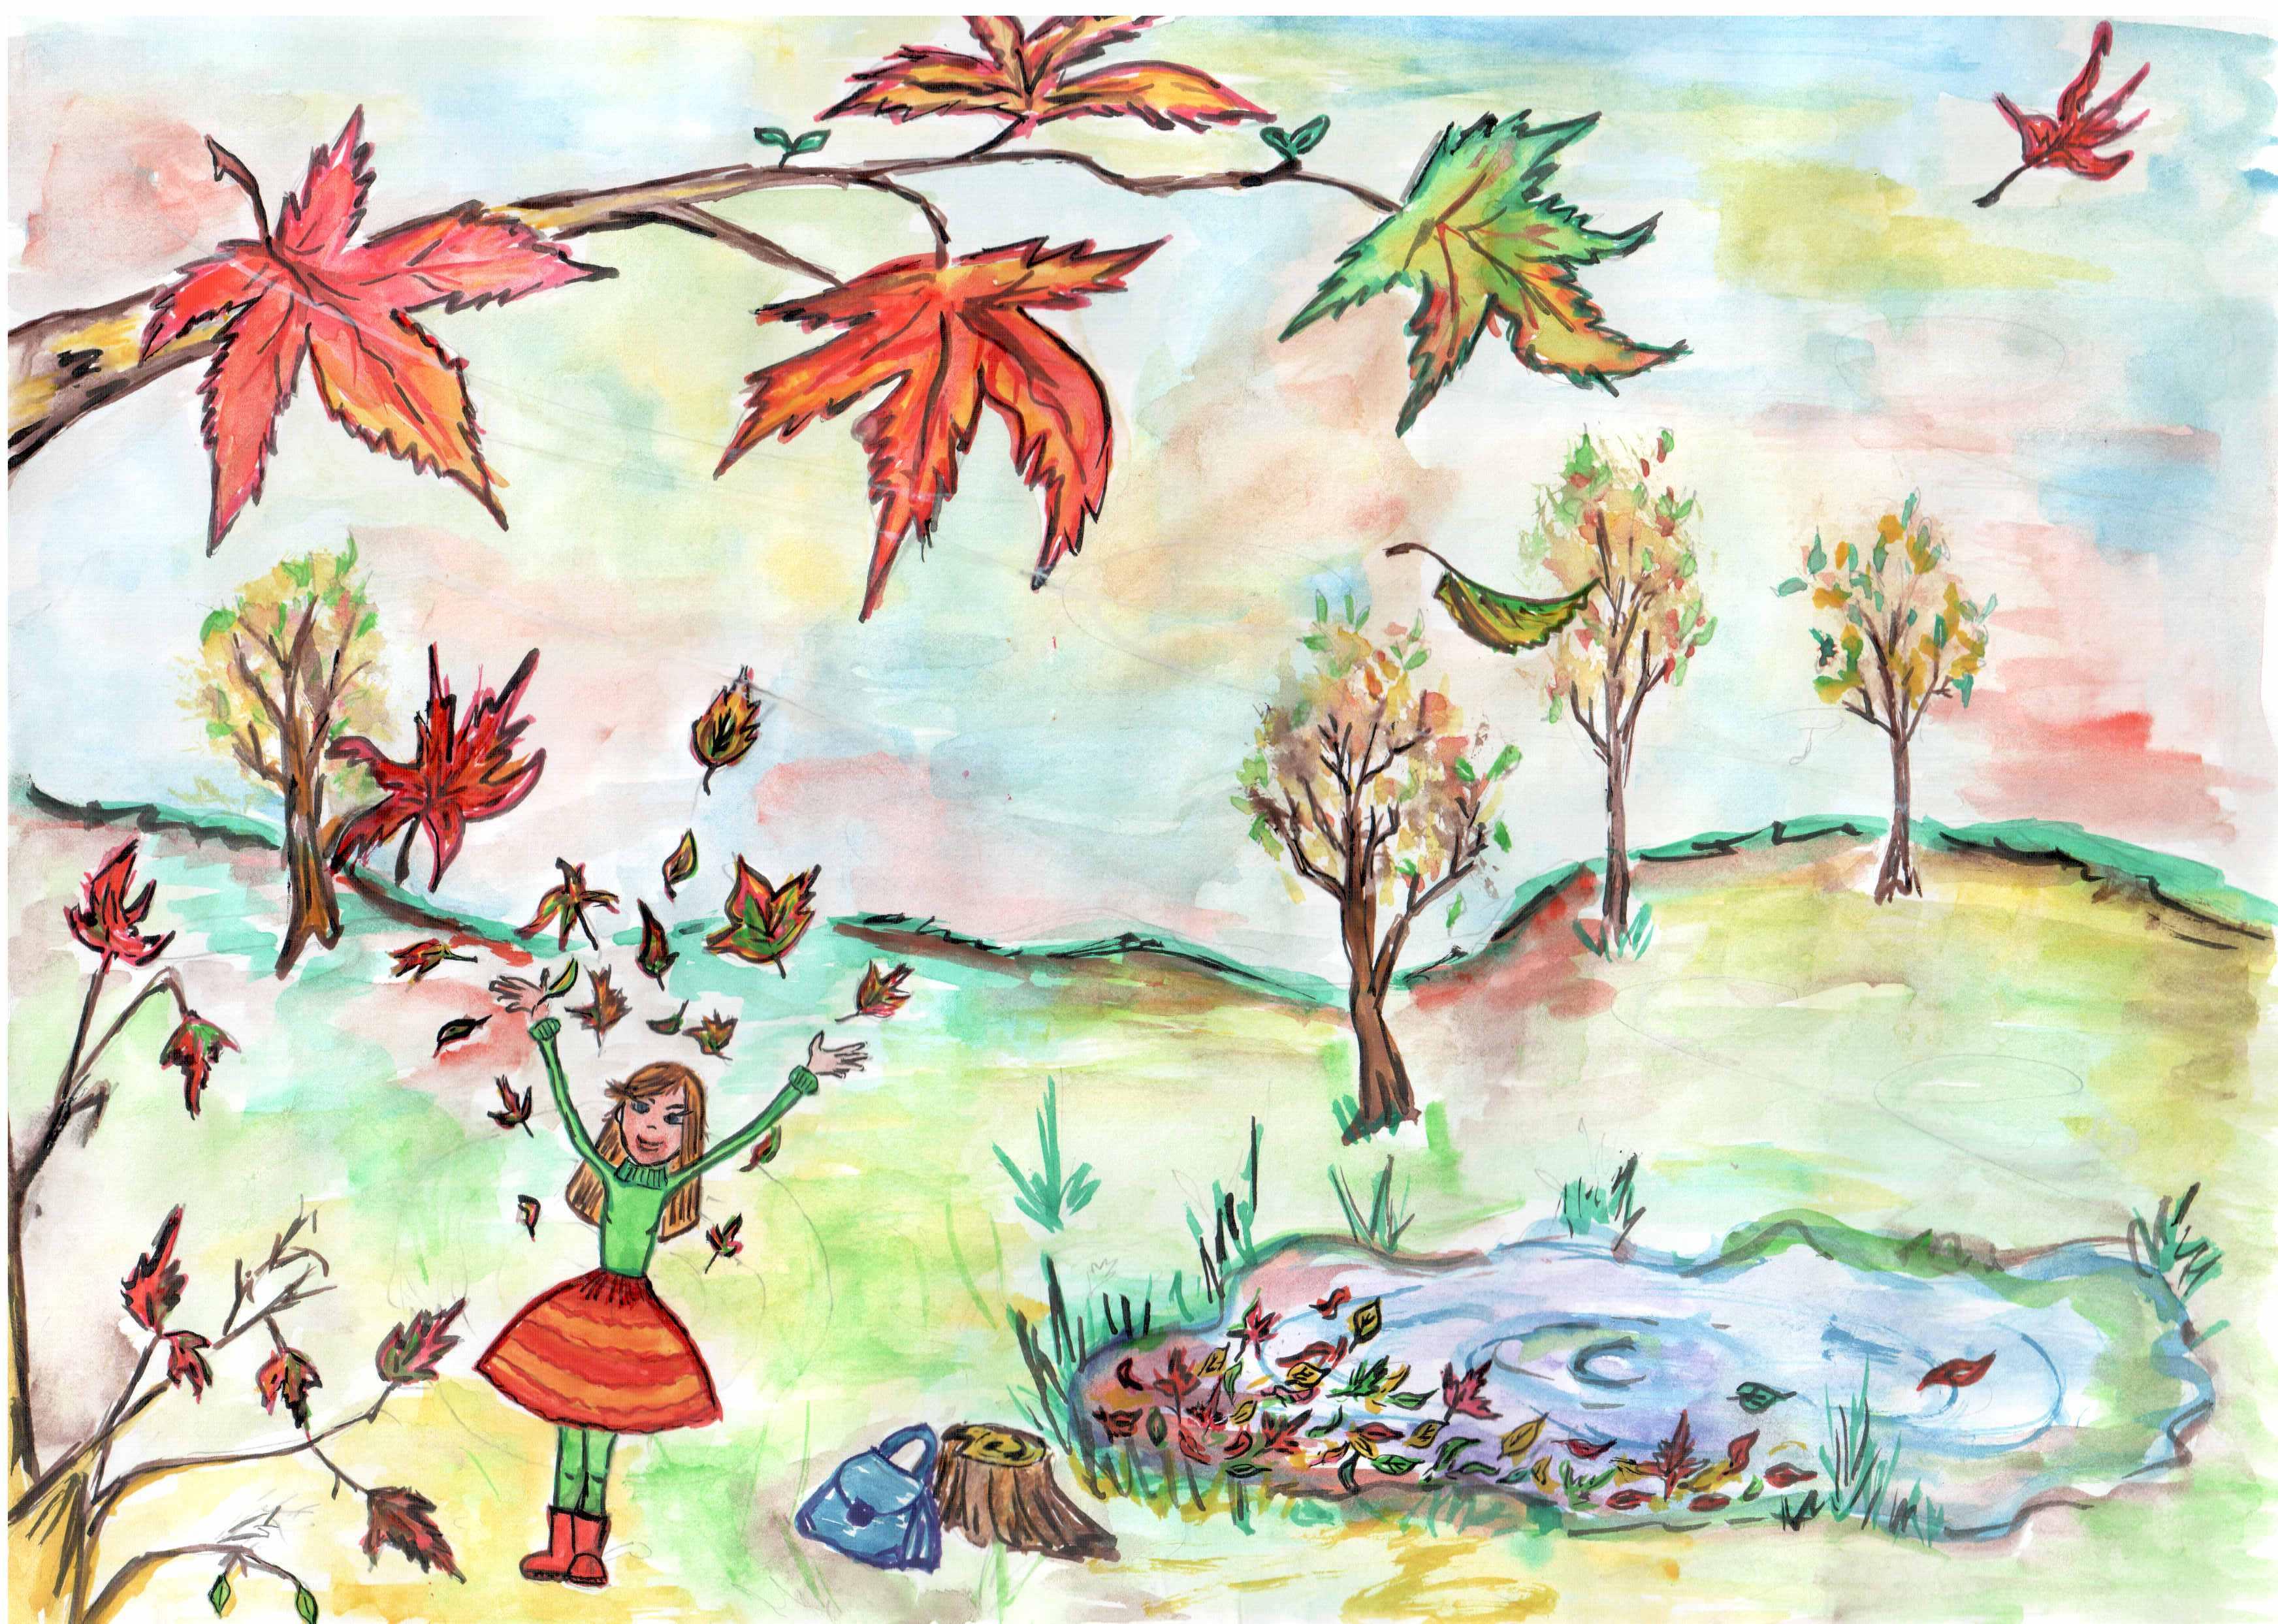 http://boombob.ru/img/picture/Oct/13/4cb328477cad53fb447ce4e924dc53de/6.jpg